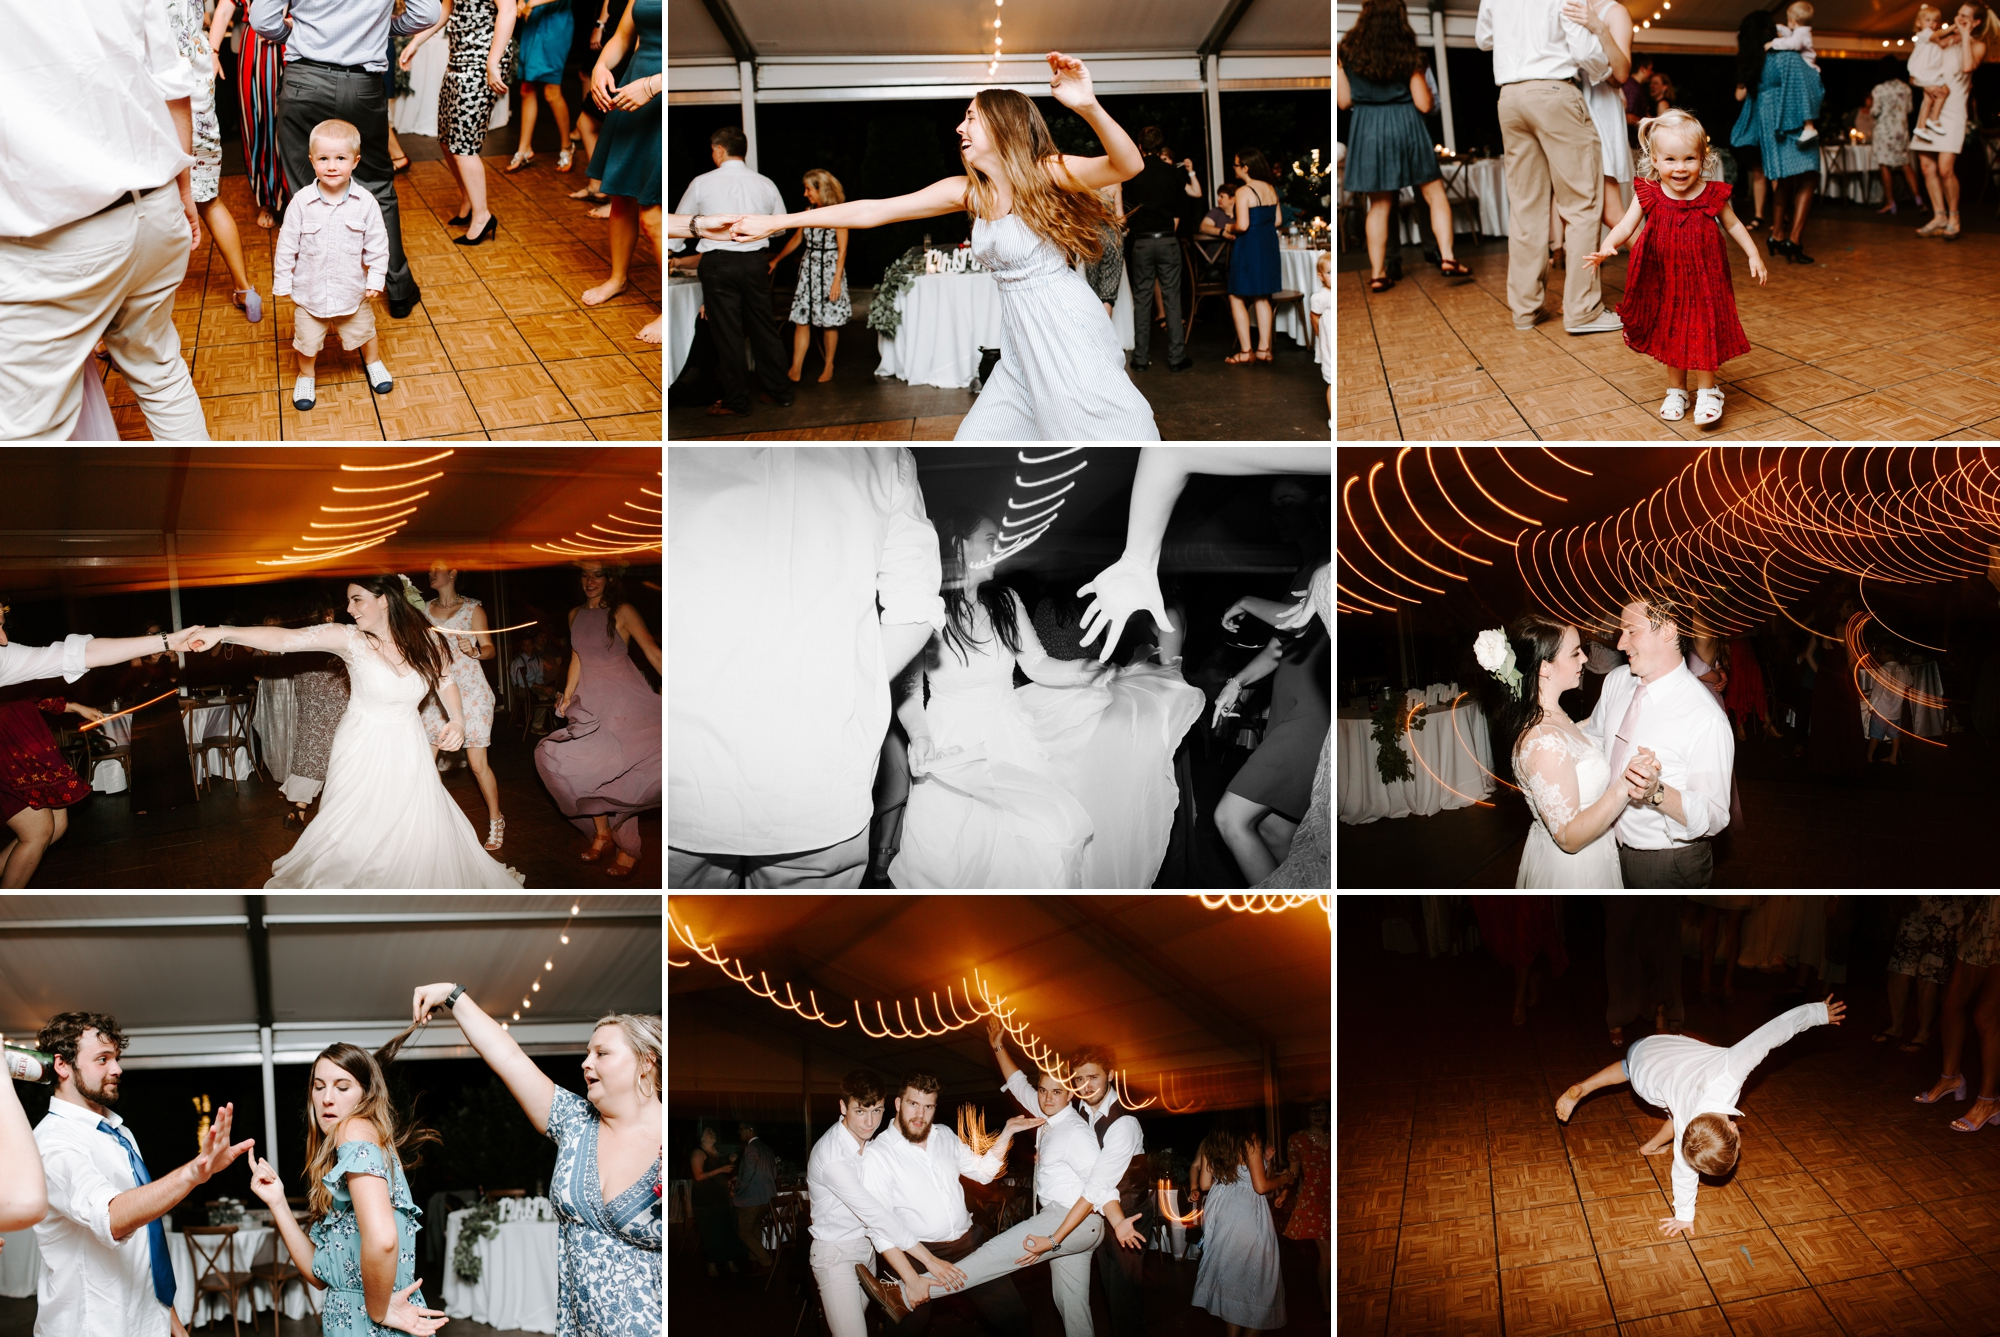 guests-dancing-at-reception.jpg